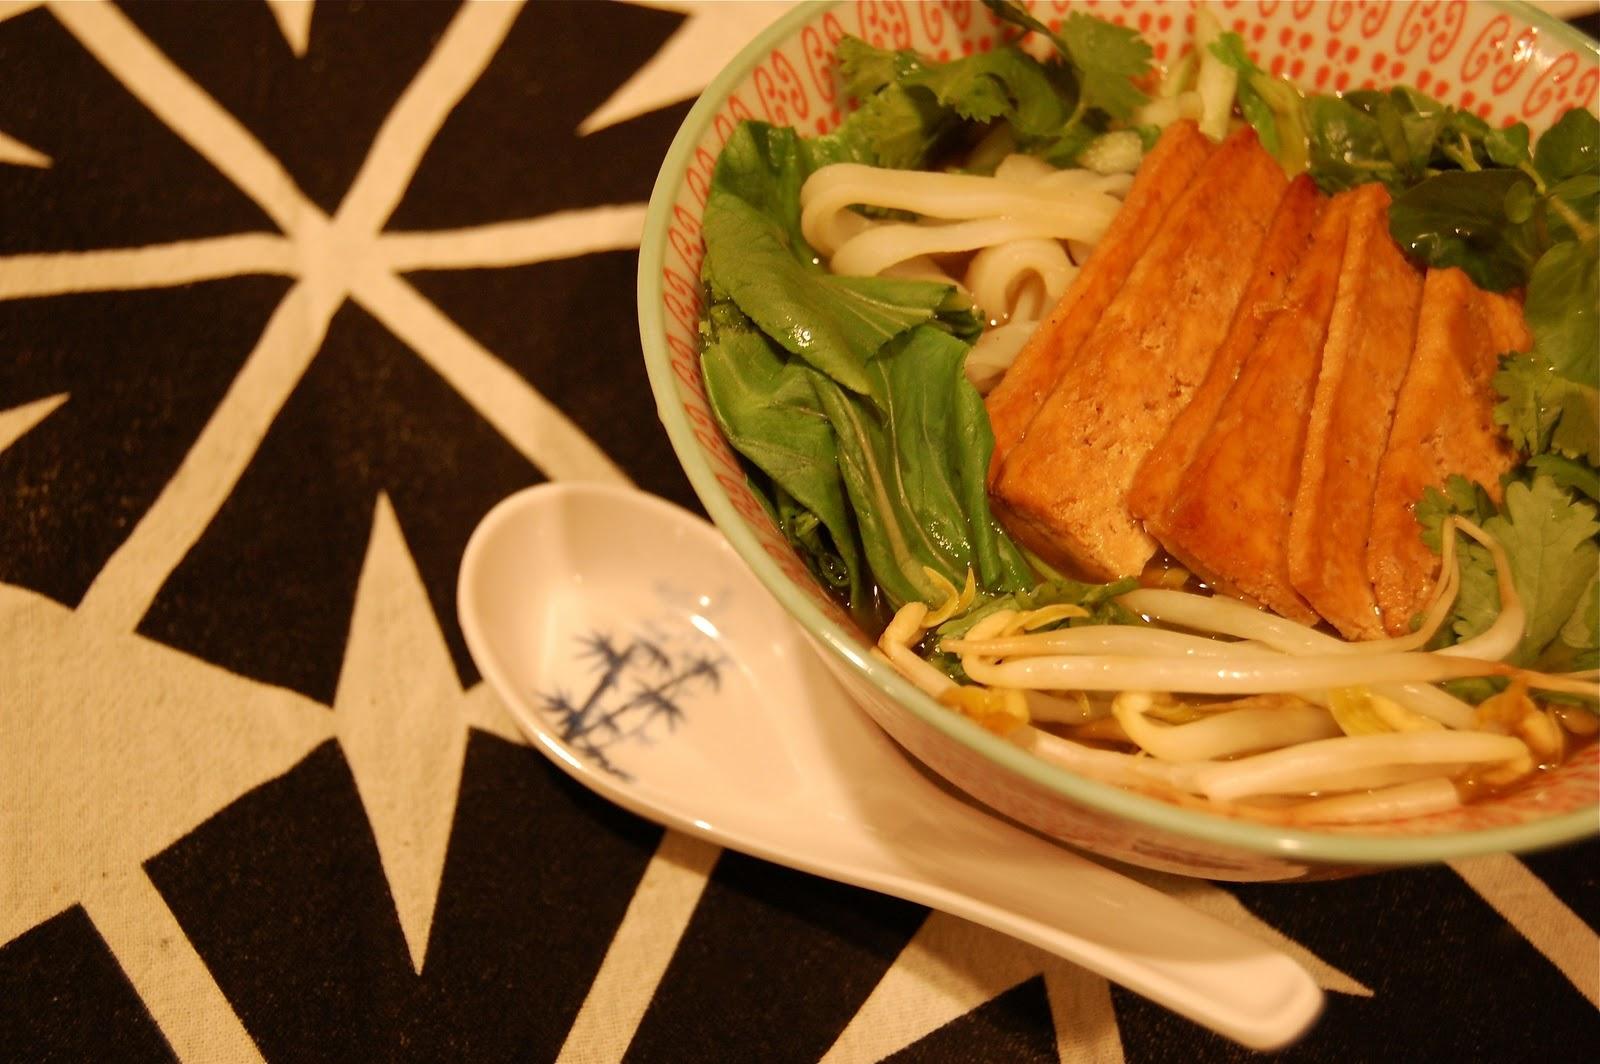 Vegetarian+Pho+Vietnamese+Noodle+Soup+s%26s.jpg